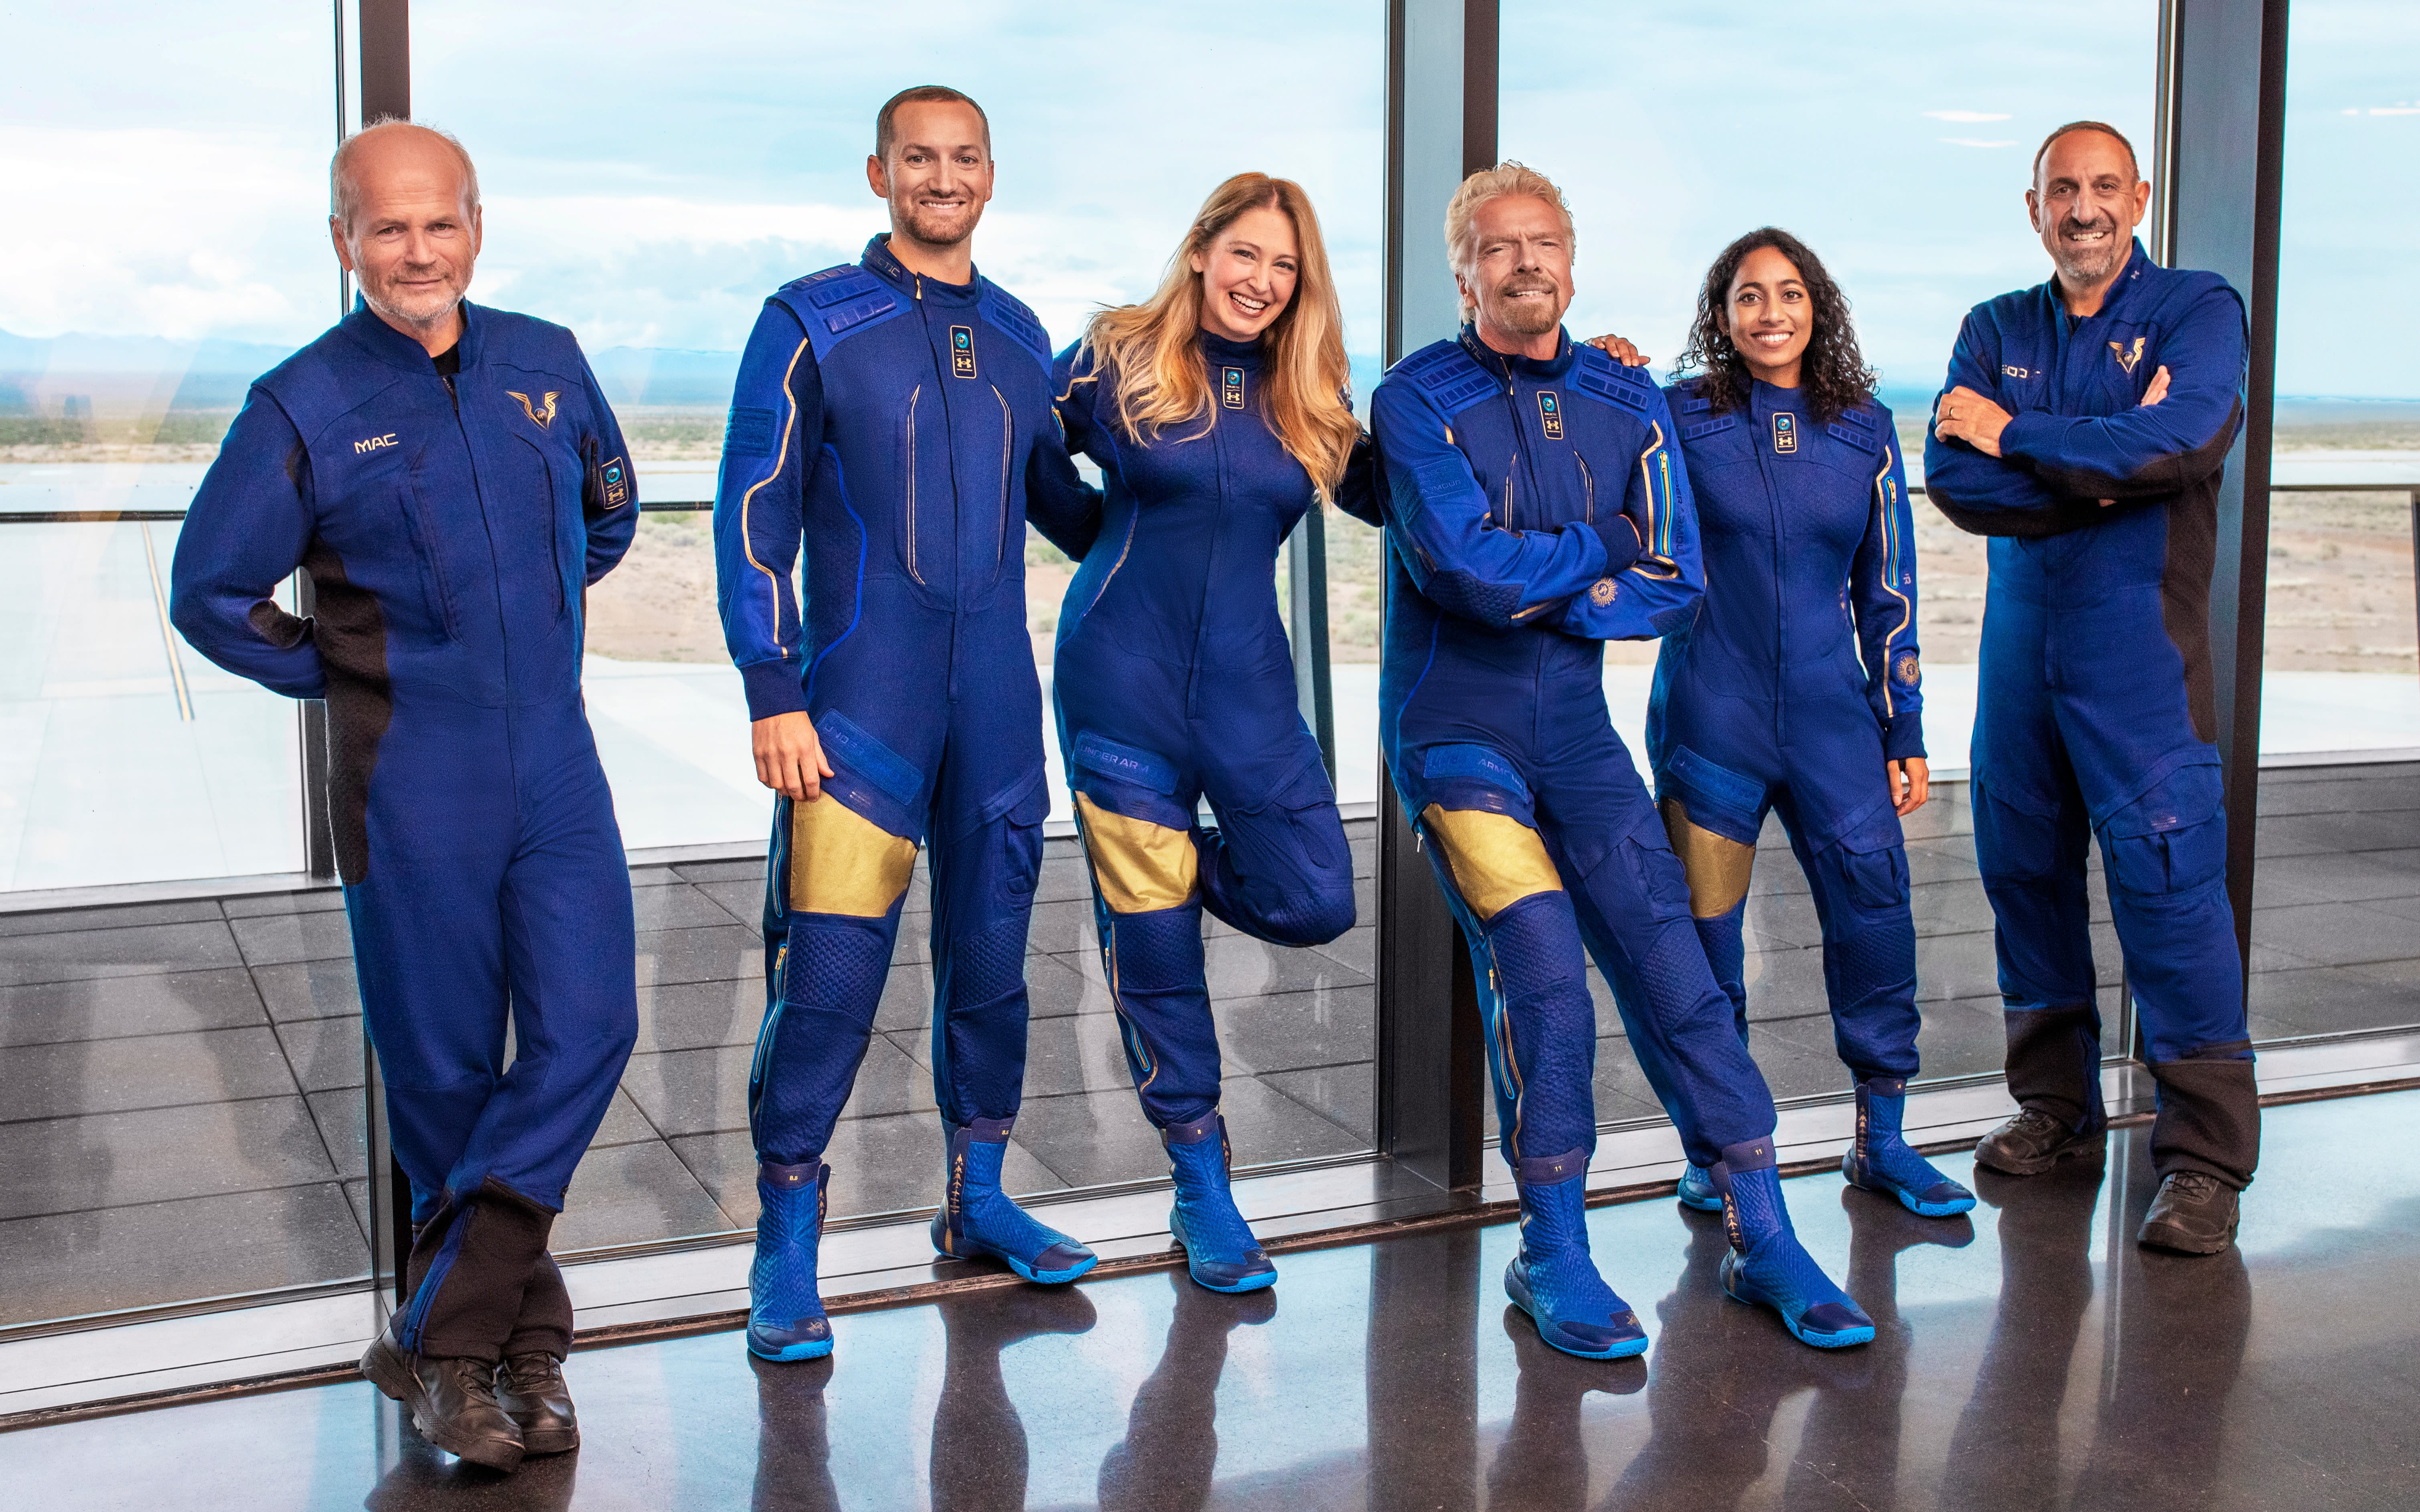 The Virgin Galactic Unity 22 crew